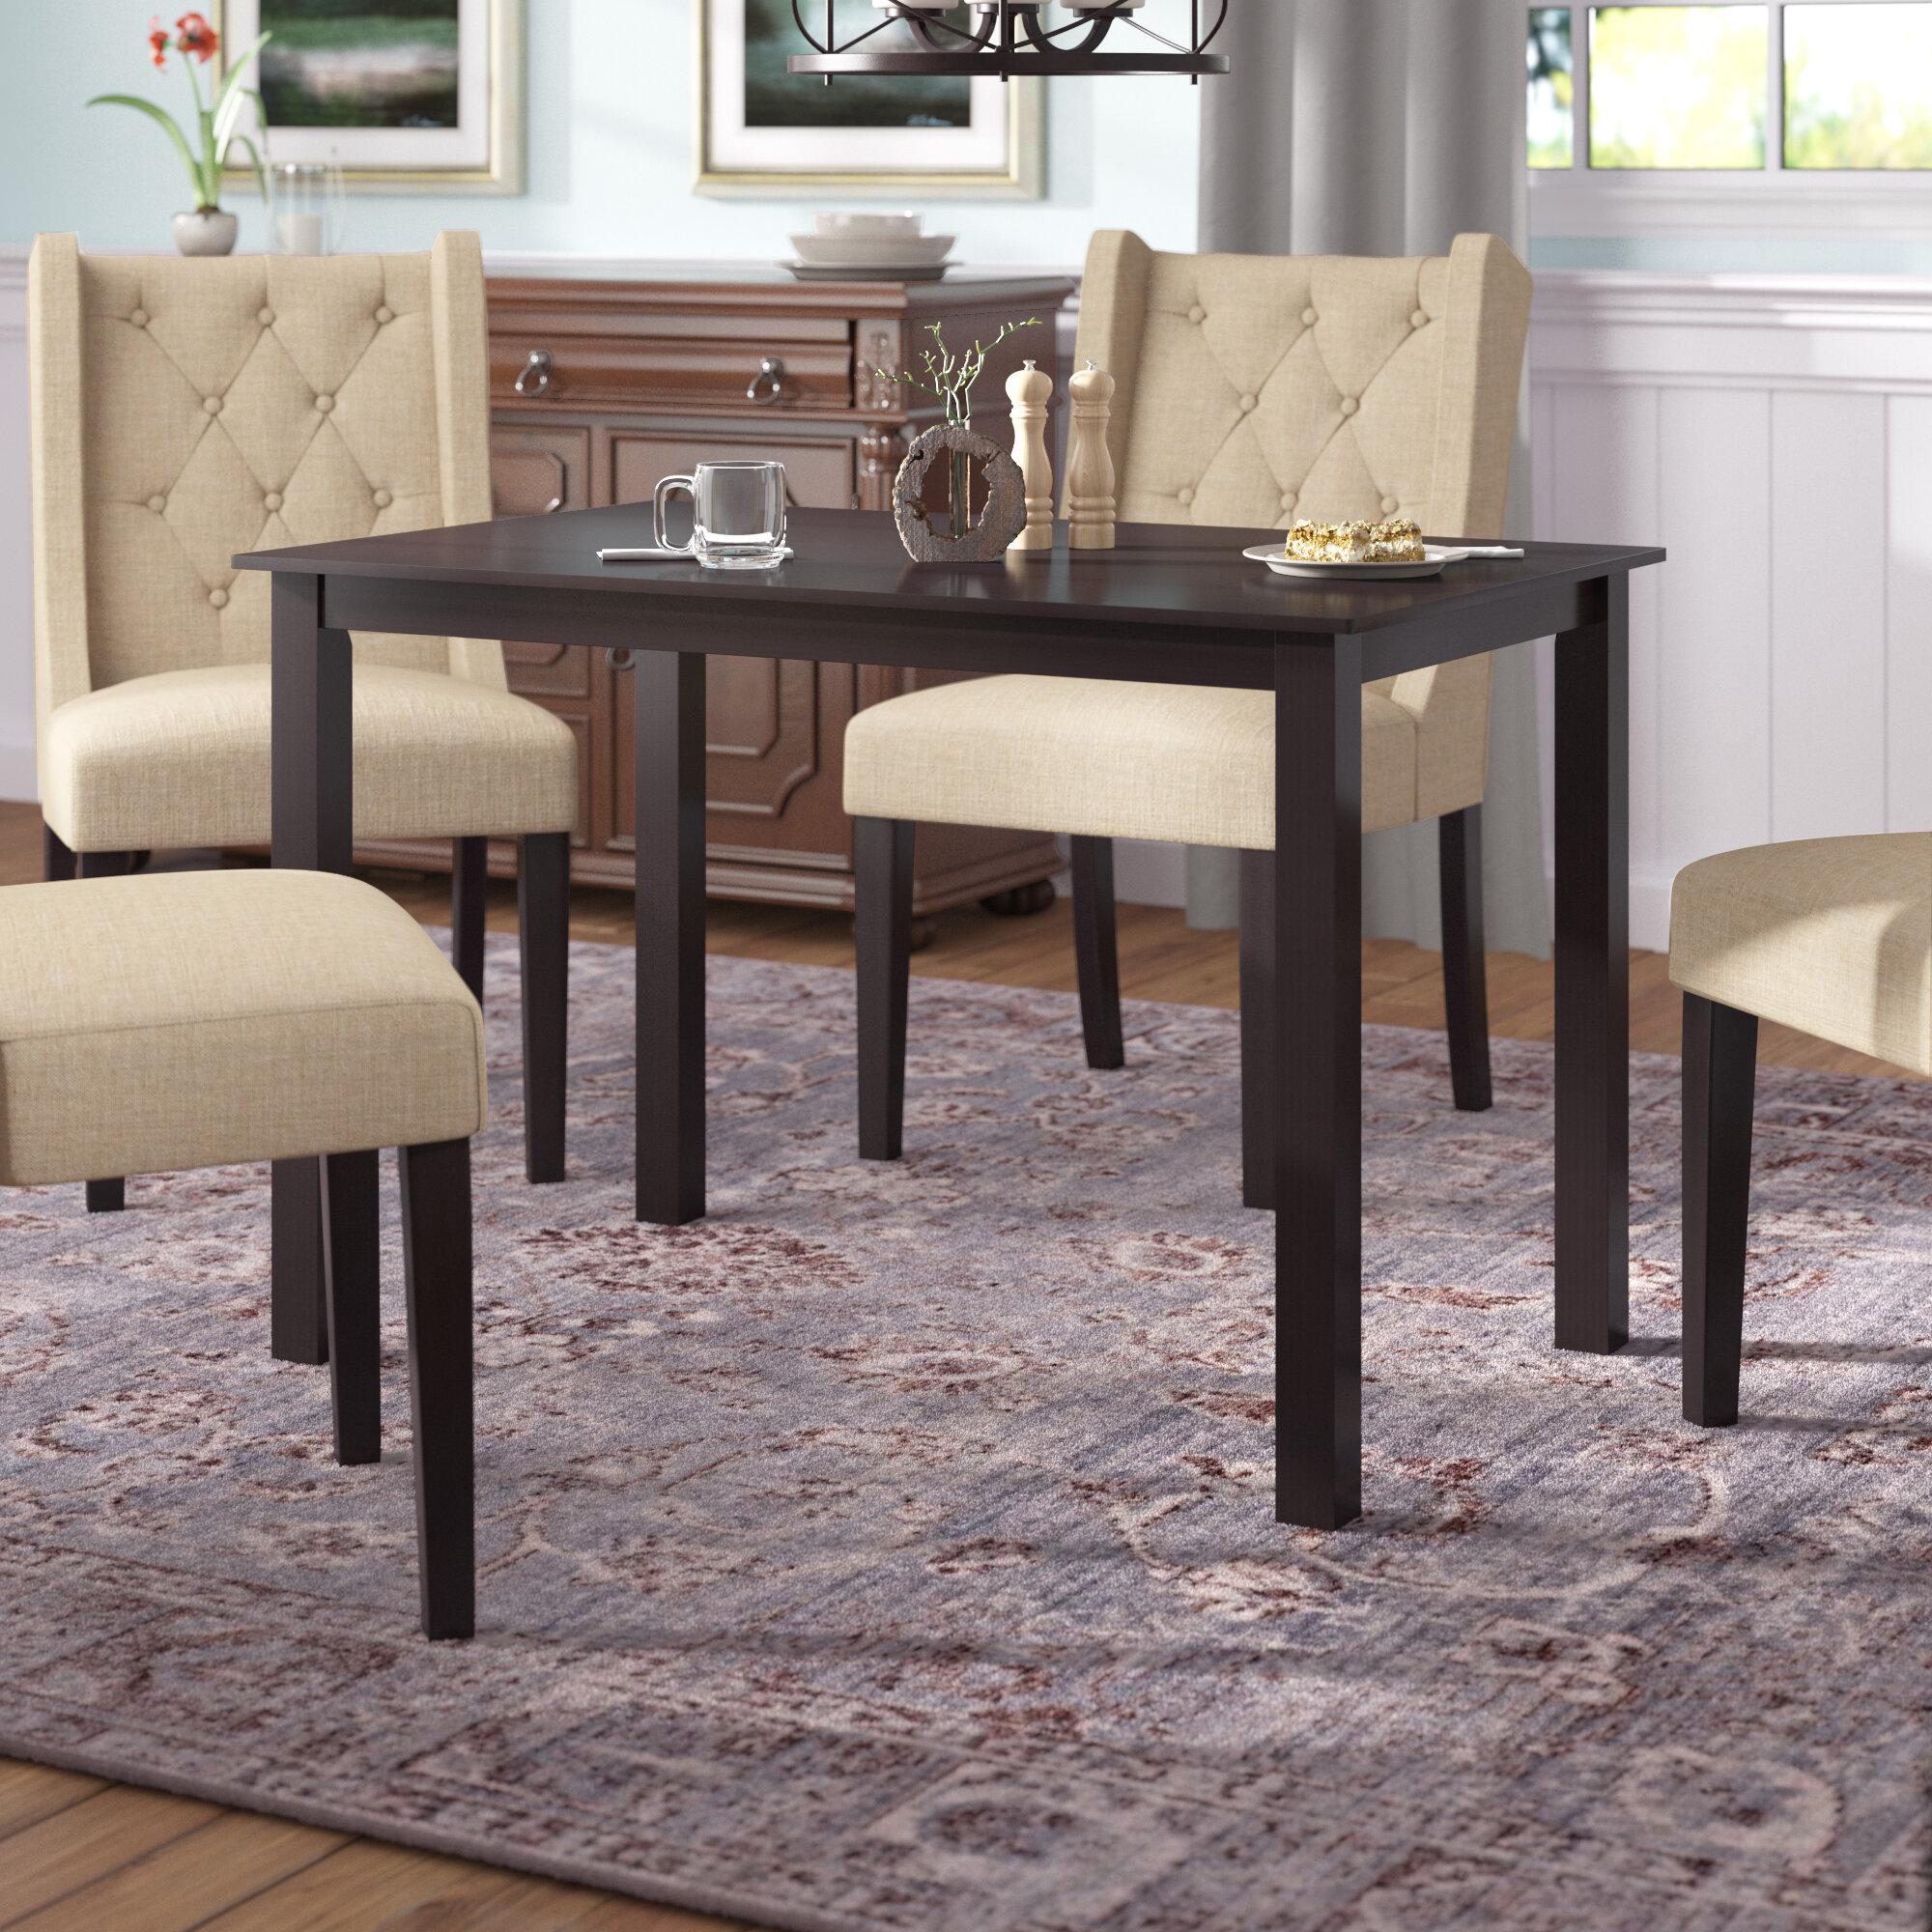 Winston porter douglas solid wood dining table reviews wayfair